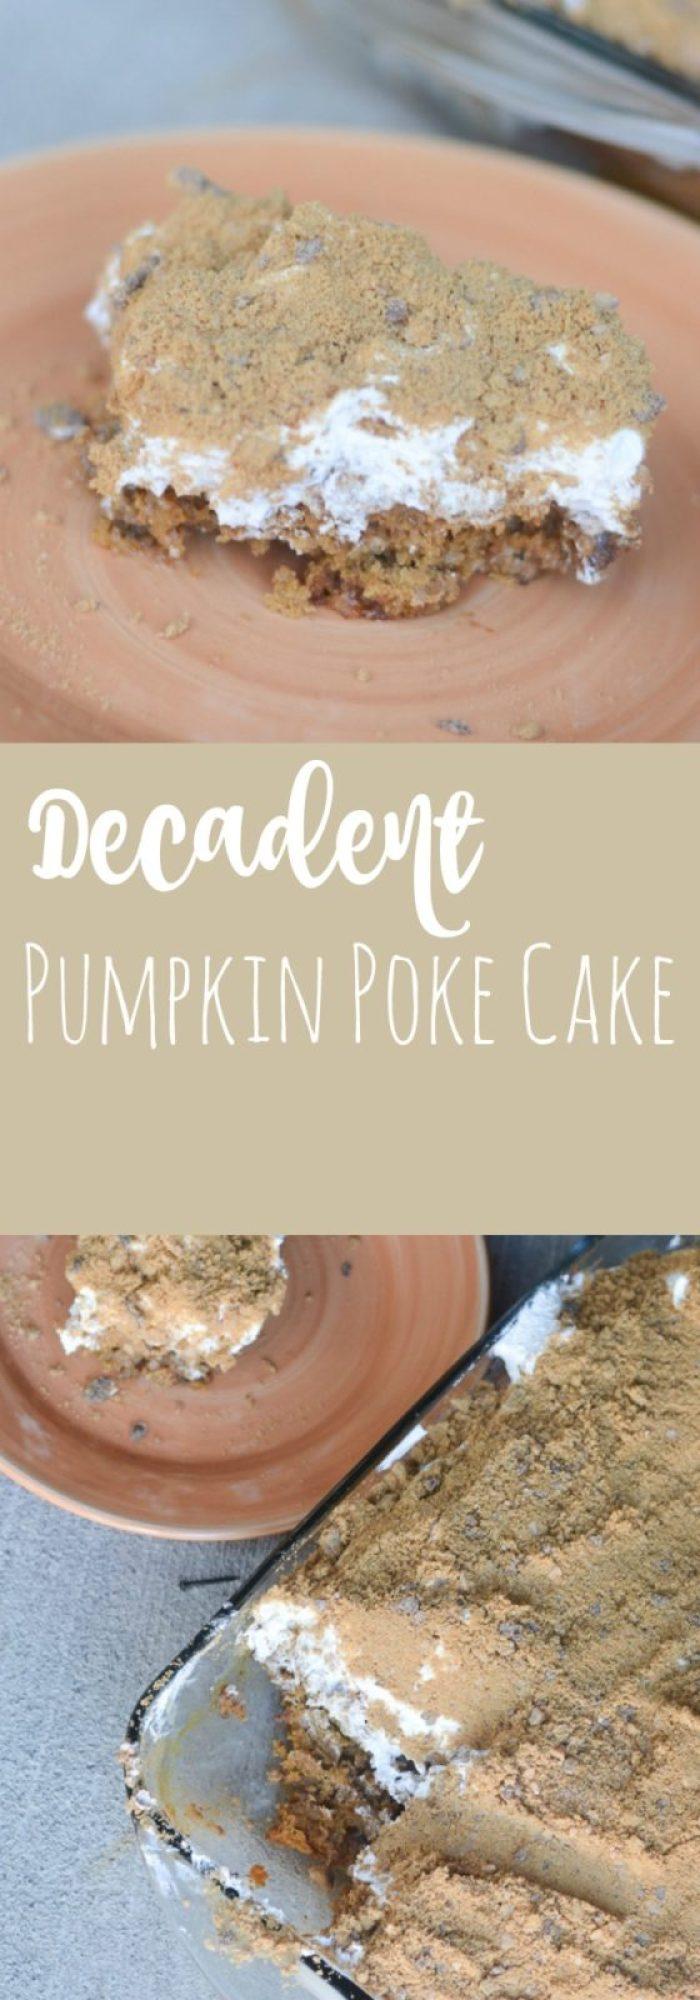 A rich, decadent butterscotch pumpkin poke cake - a delicious fall dessert that can feed a crowd!